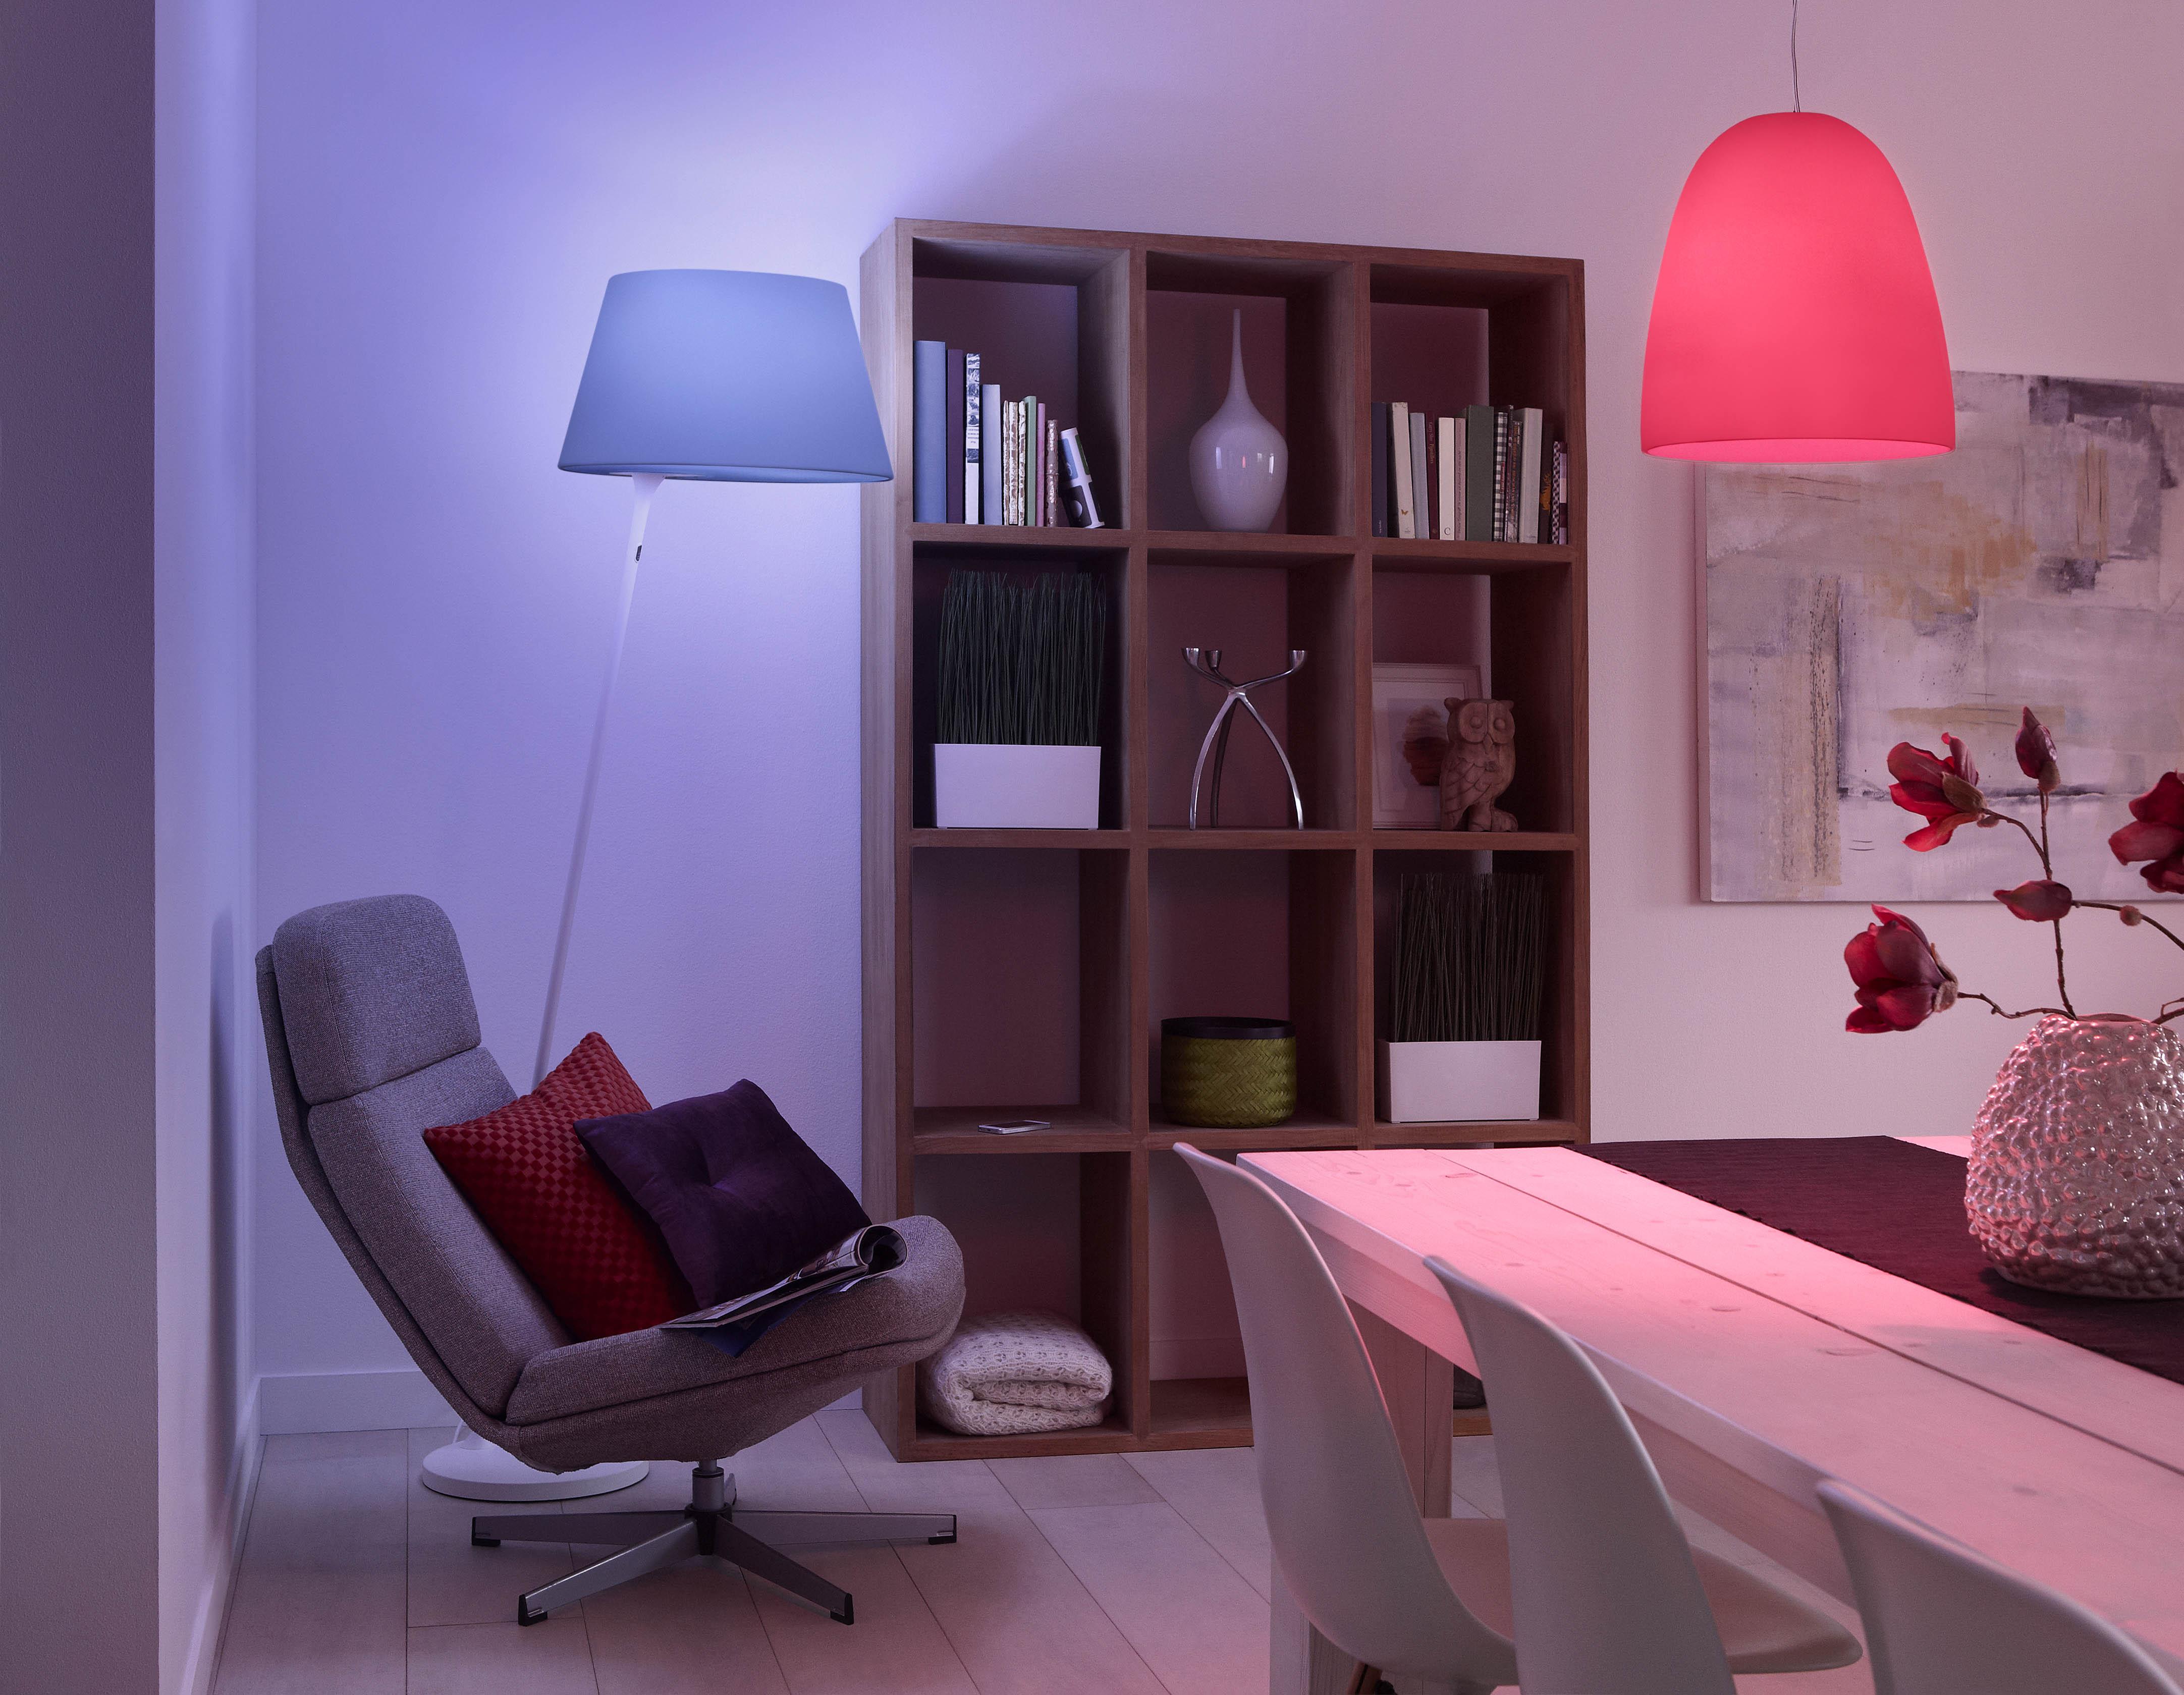 hue lighting ideas. download hi-res photo hue lighting ideas